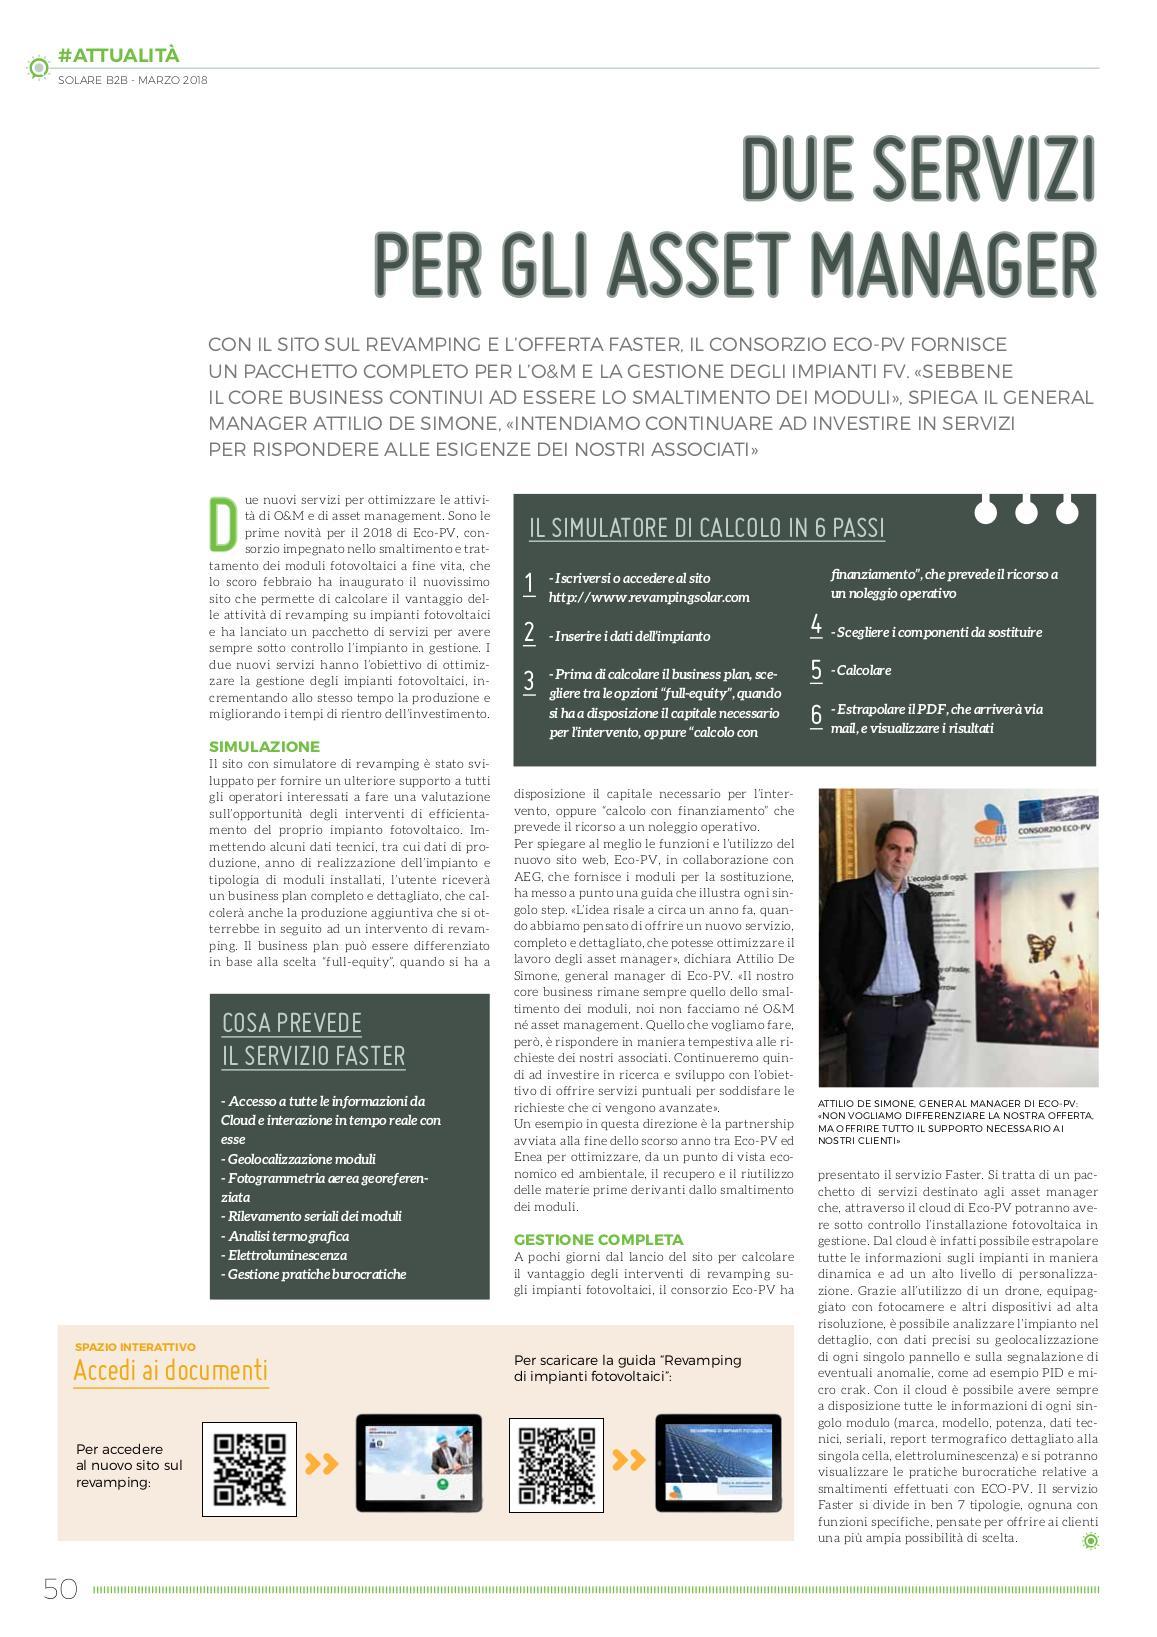 due servizi per gli asset manager